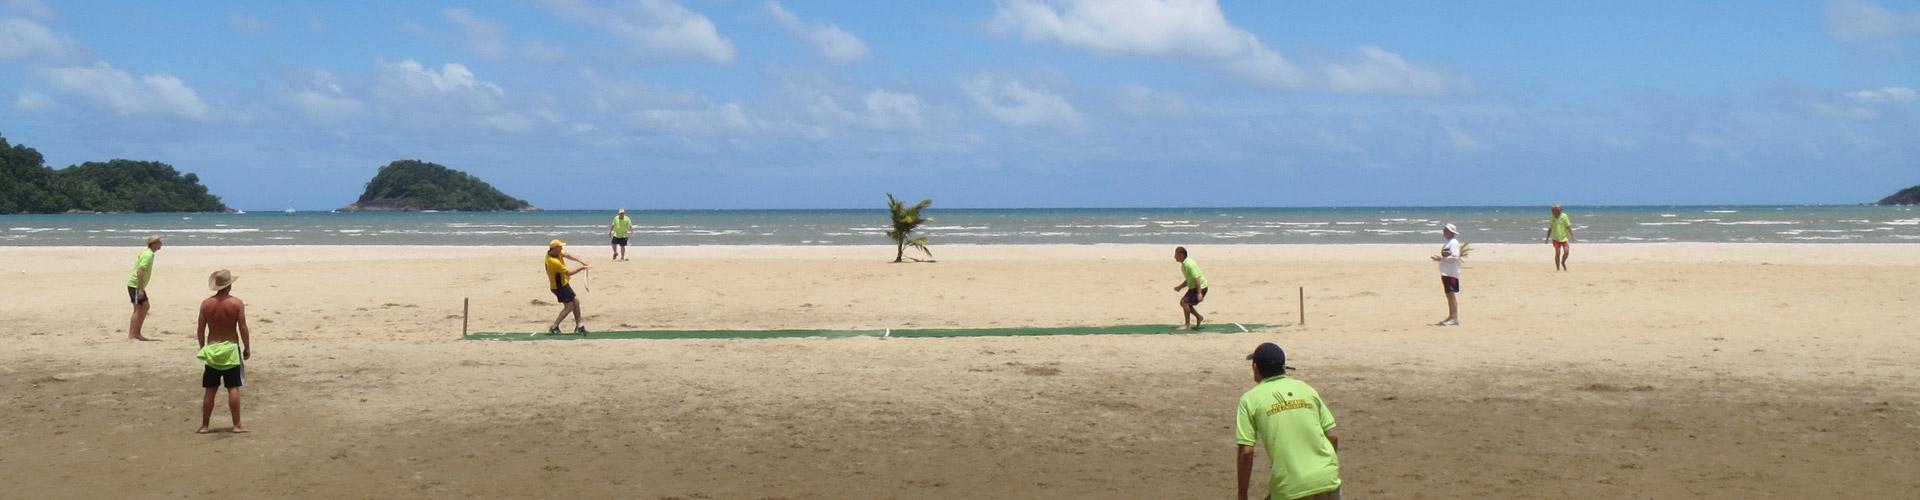 koh chang beach cricket match 2